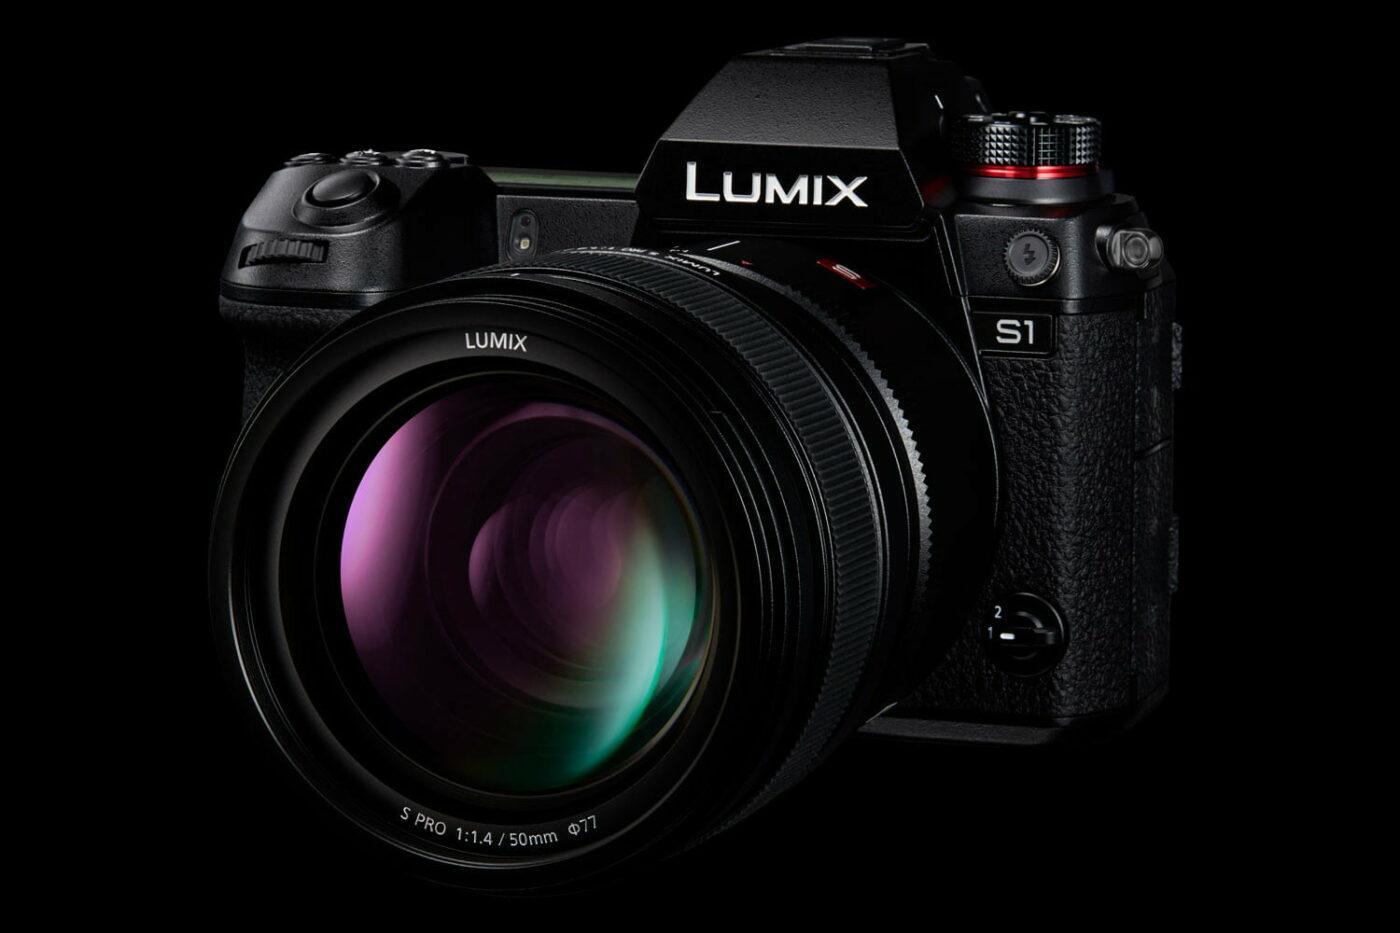 panasonic lumix s1 front 50mm 1500x1000